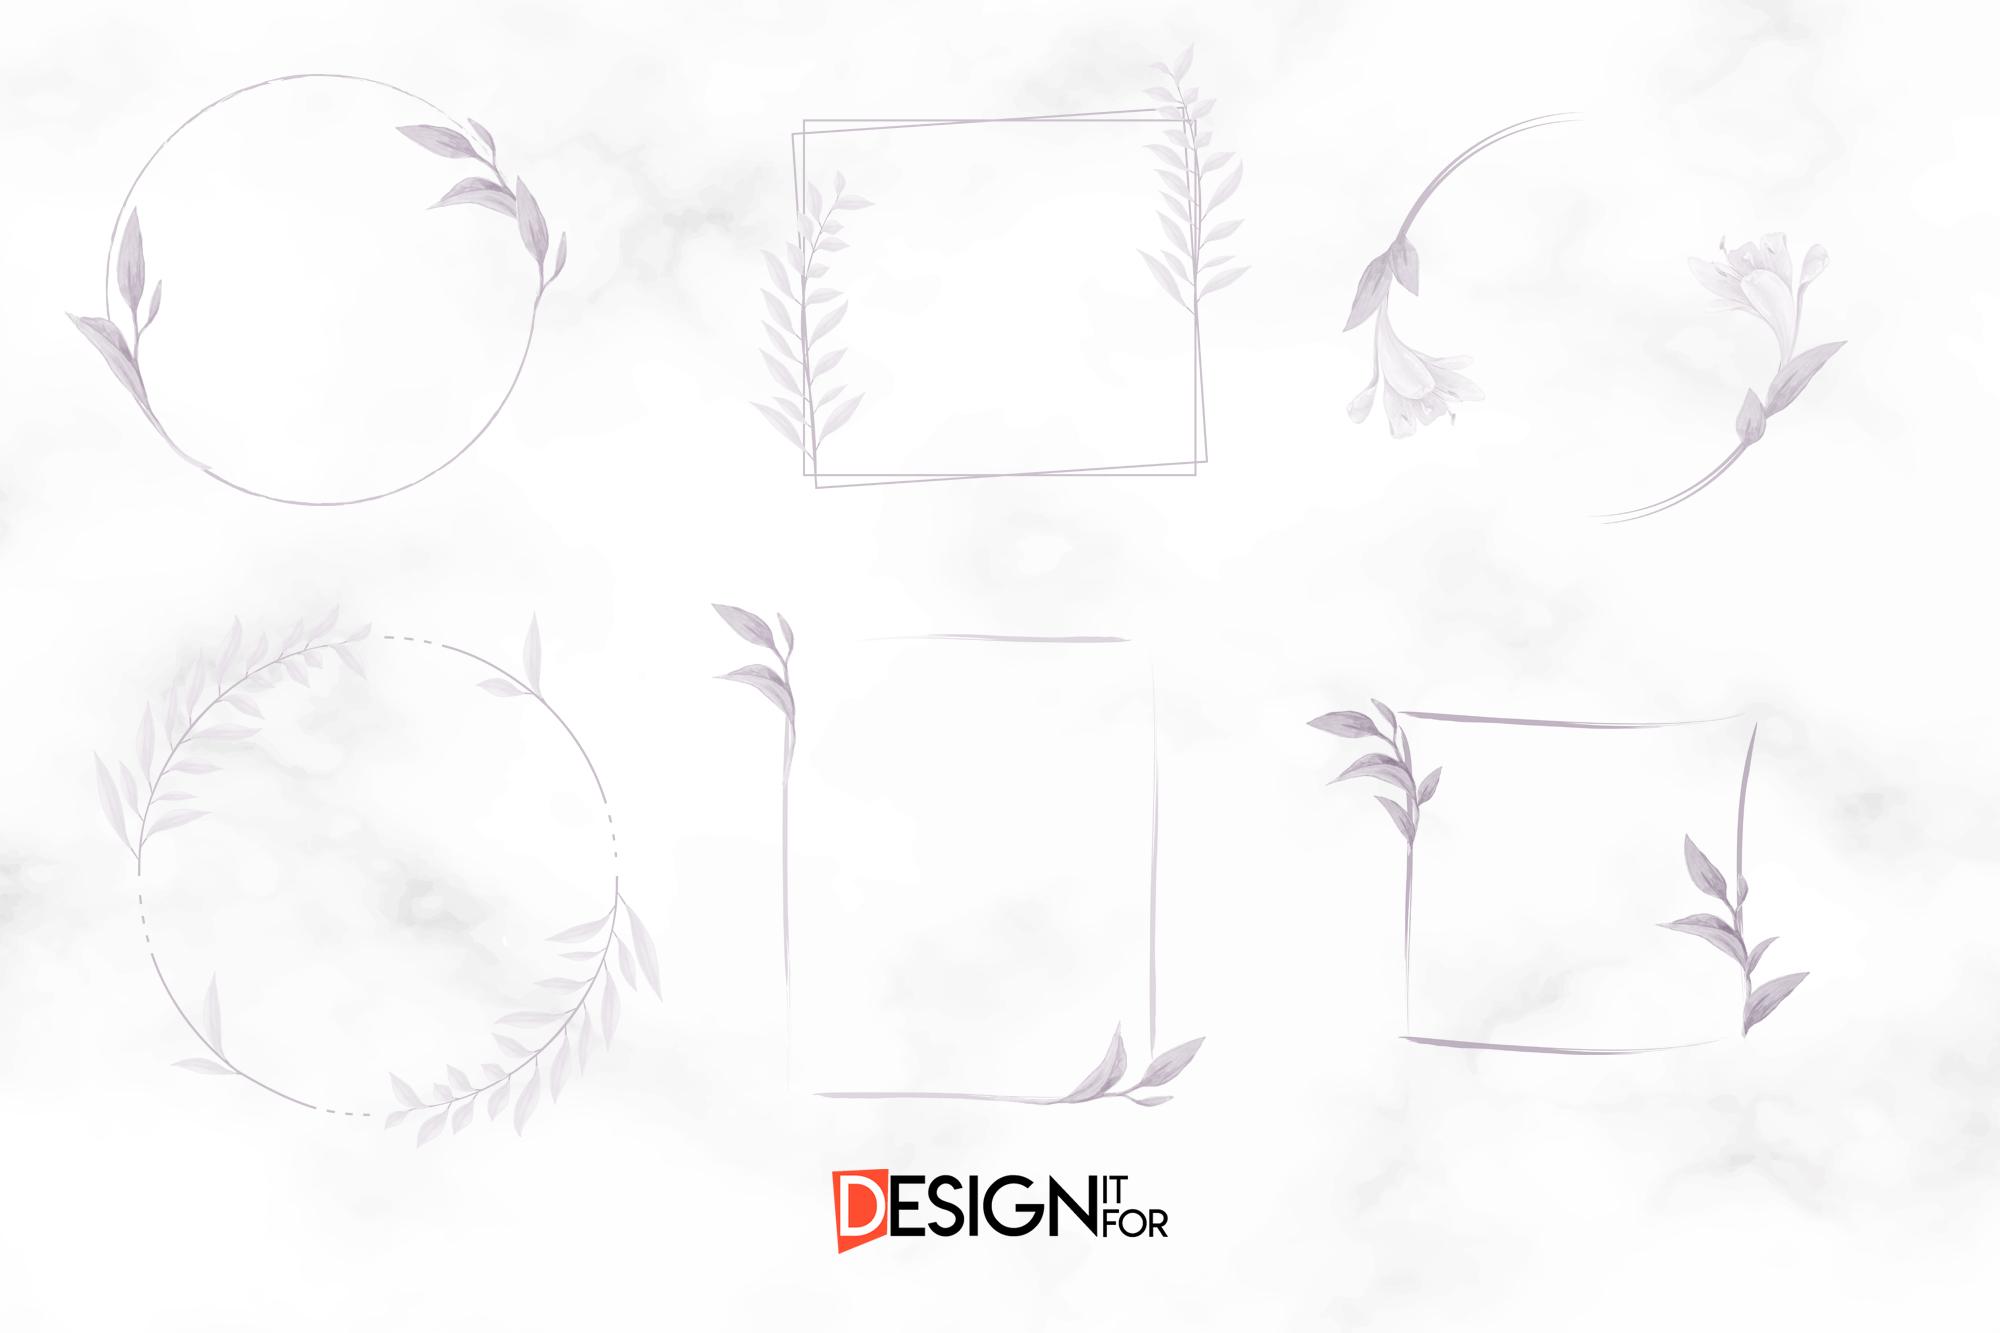 Floral Frame Clipart, Laurel Wreath, clip art, scrapbooking example image 2